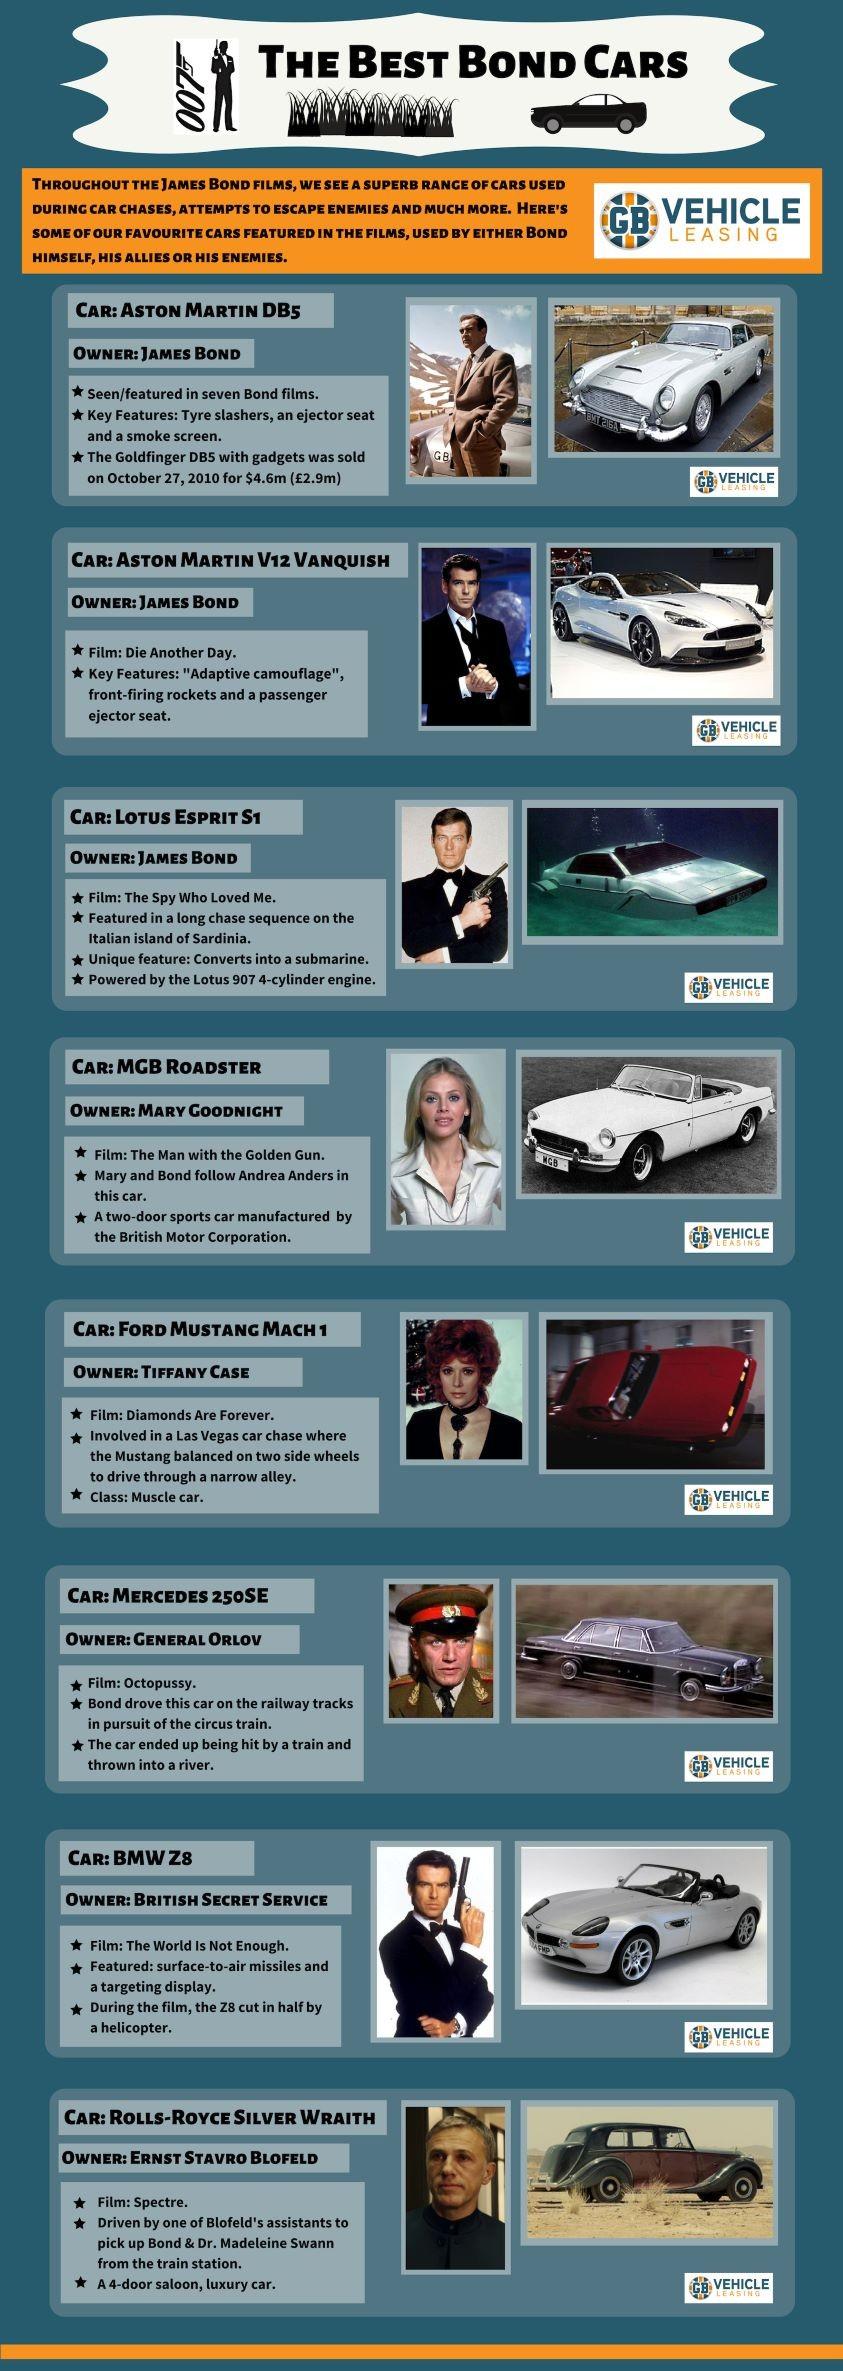 Bond Car Parade: The Best Bond Cars - Infographic